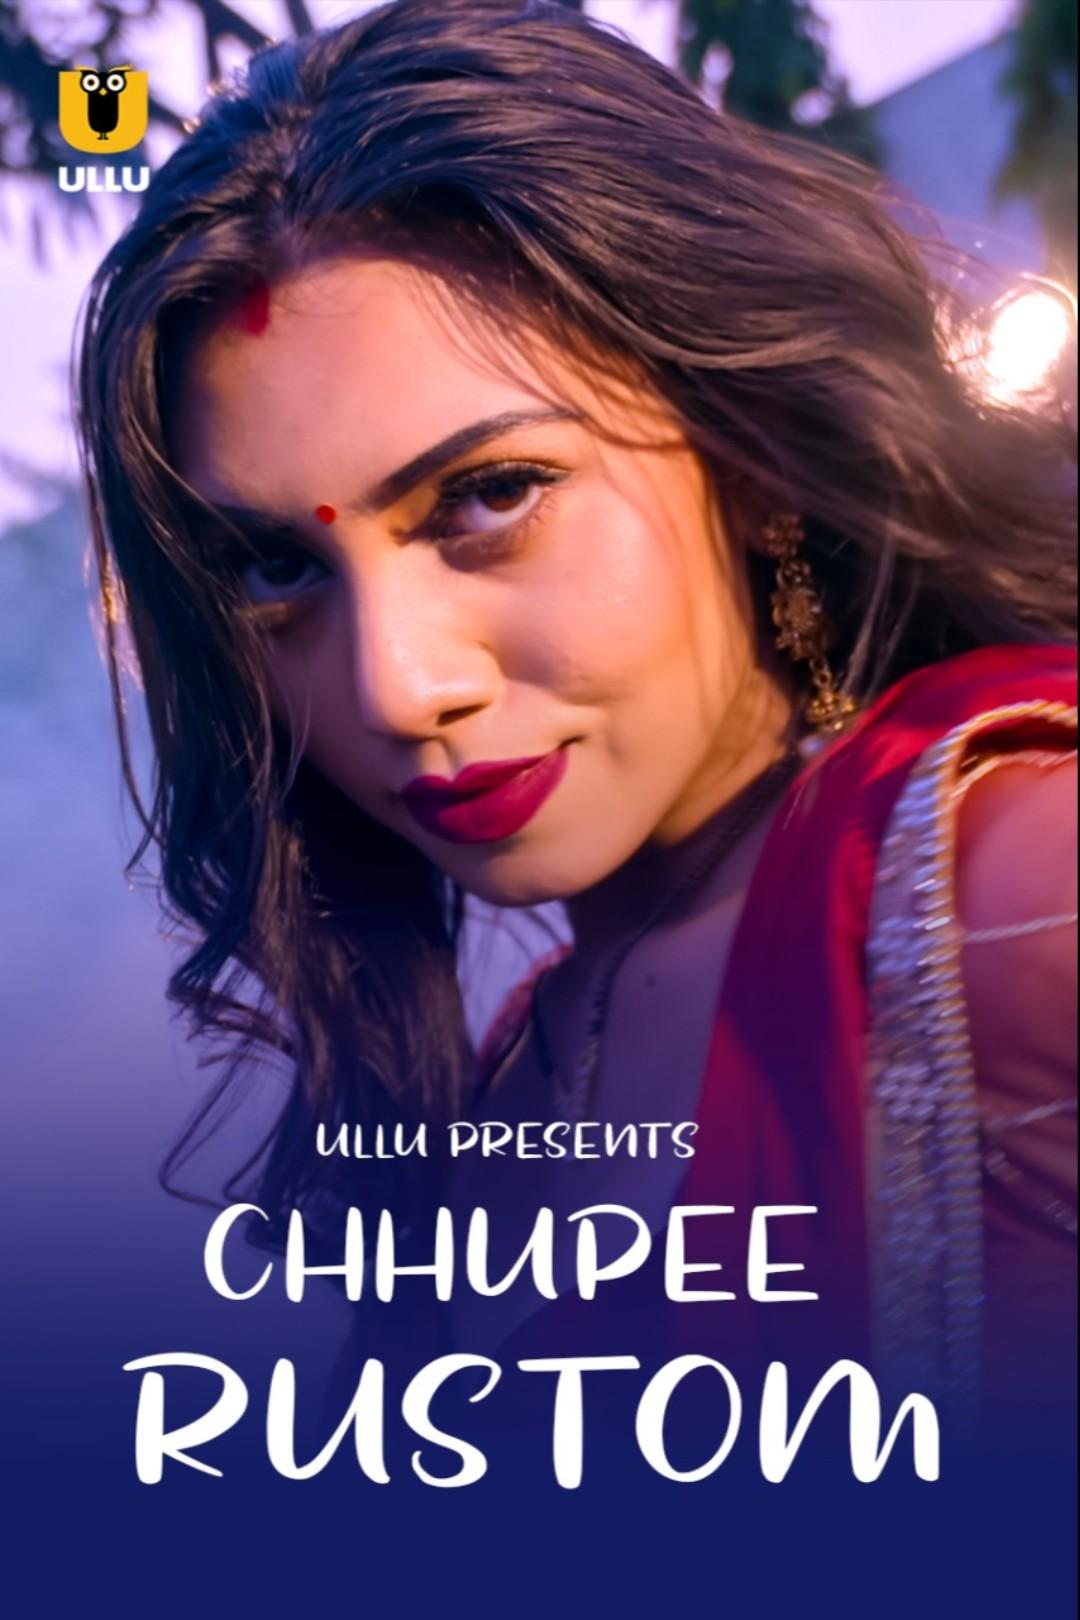 18+ Chhupee Rustom 2021 S01 Hindi Ullu Originals Complete Web Series 720p HDRip 250MB x264 AAC